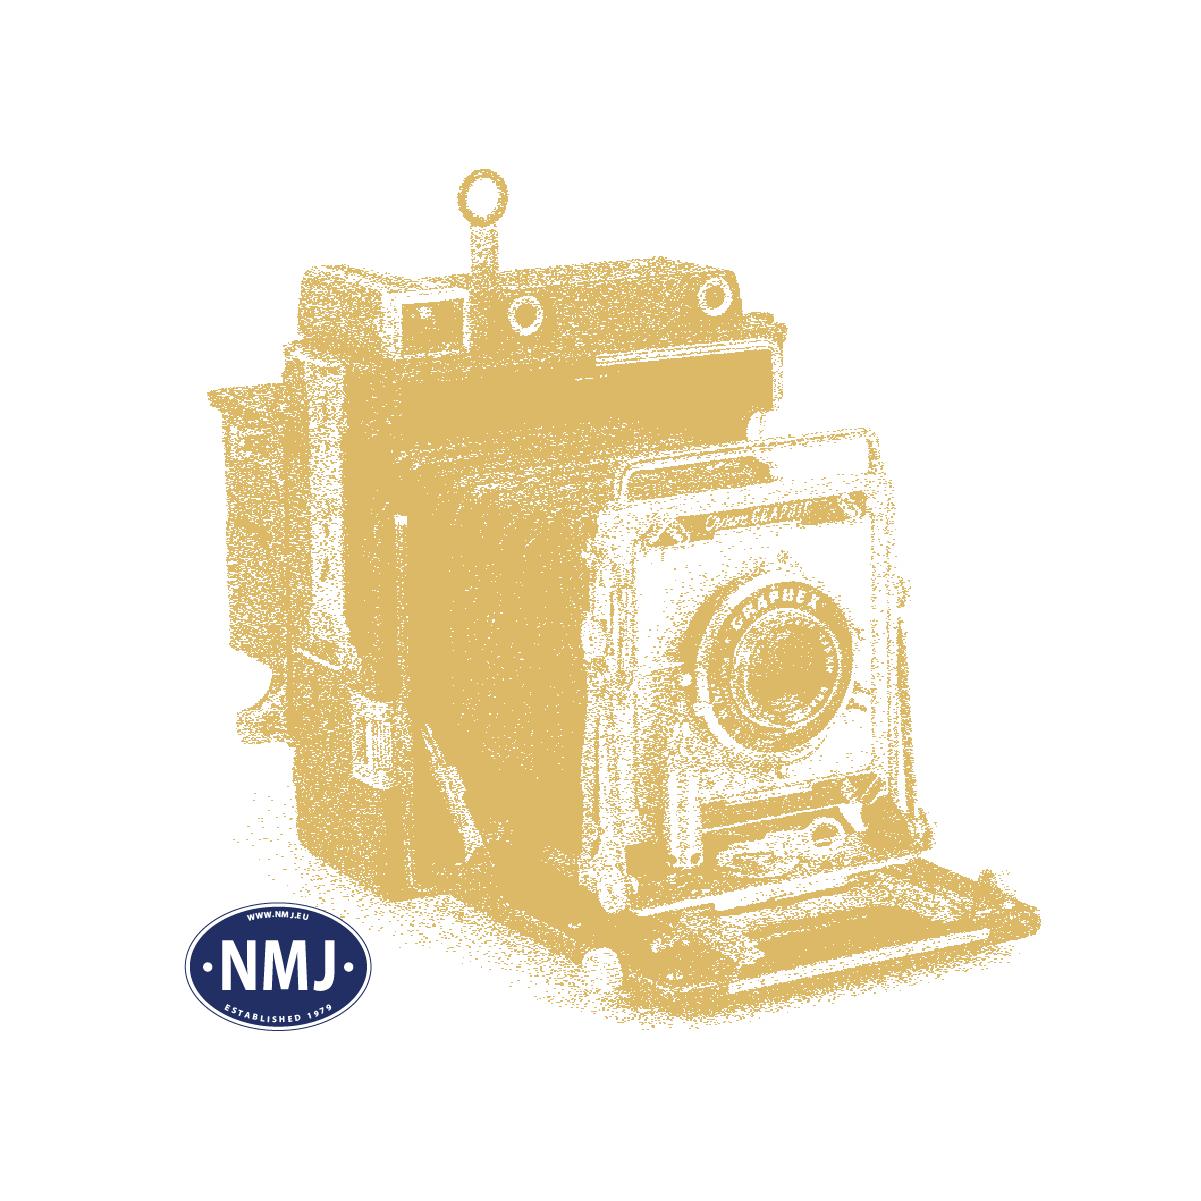 NOC15110 - Byggearbeidere